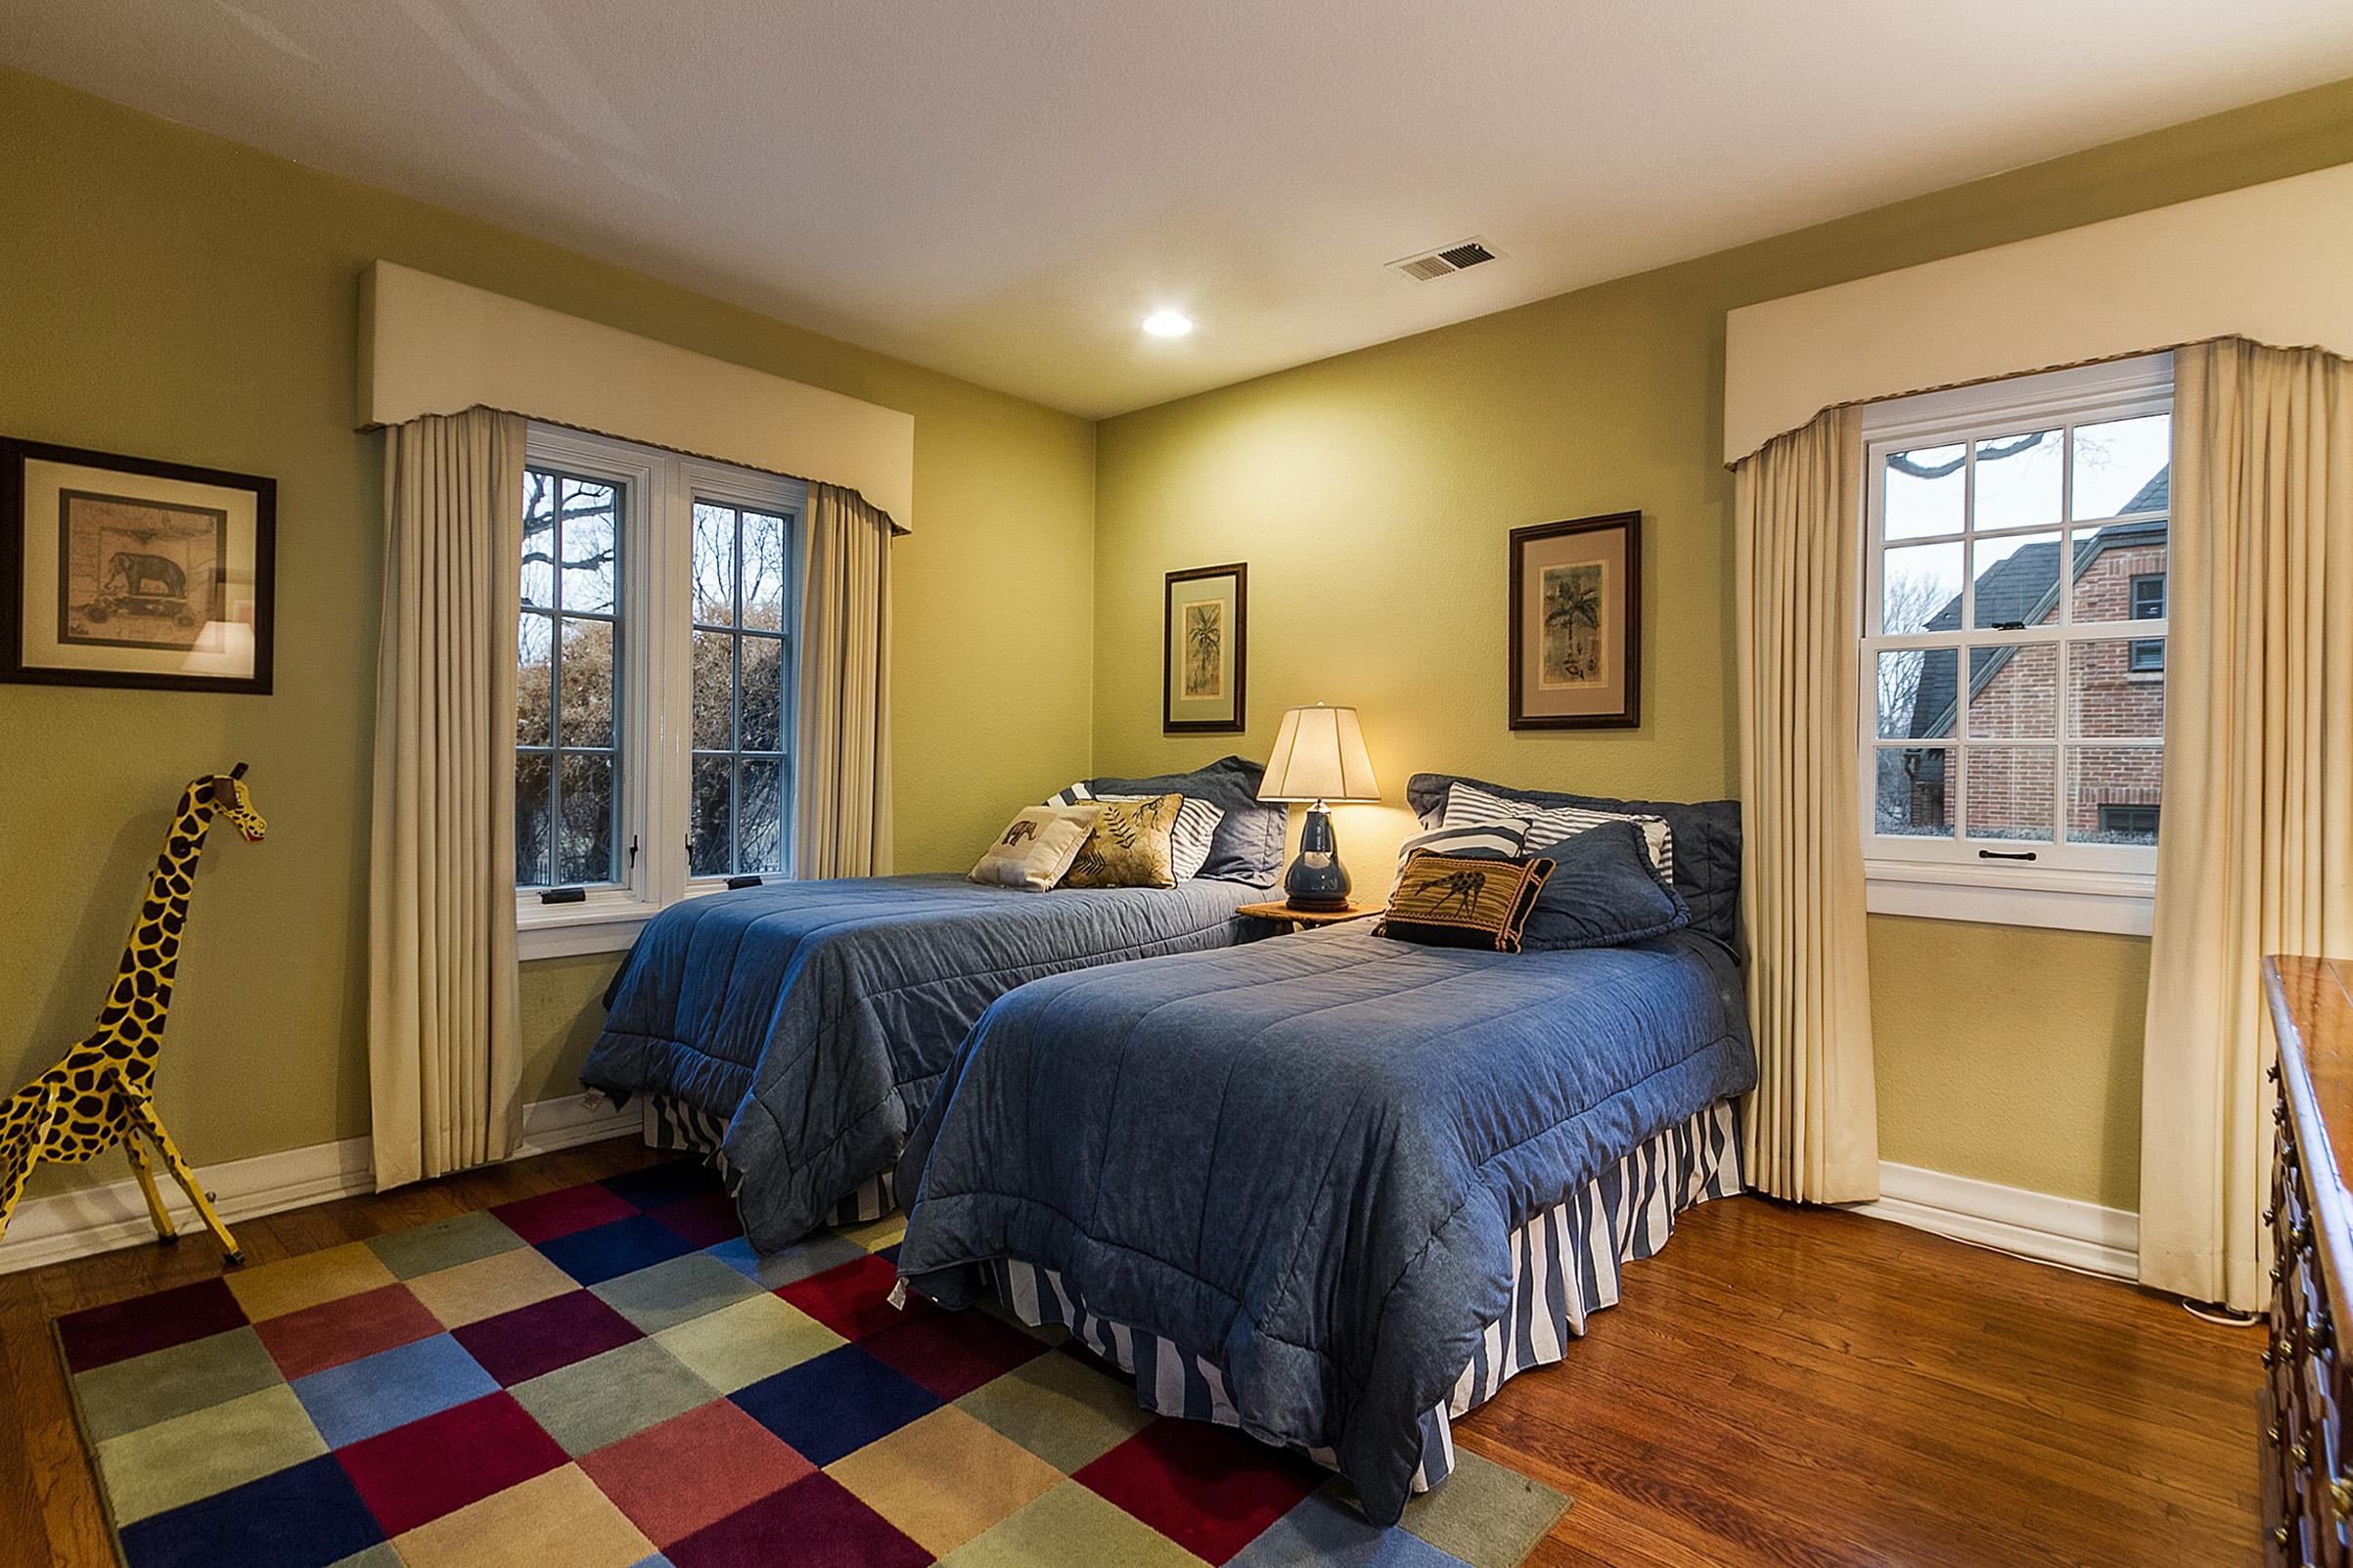 1183054_Main-Floor-Bedroom-4-Has-en-Suite-1-2-Bath_high.jpg